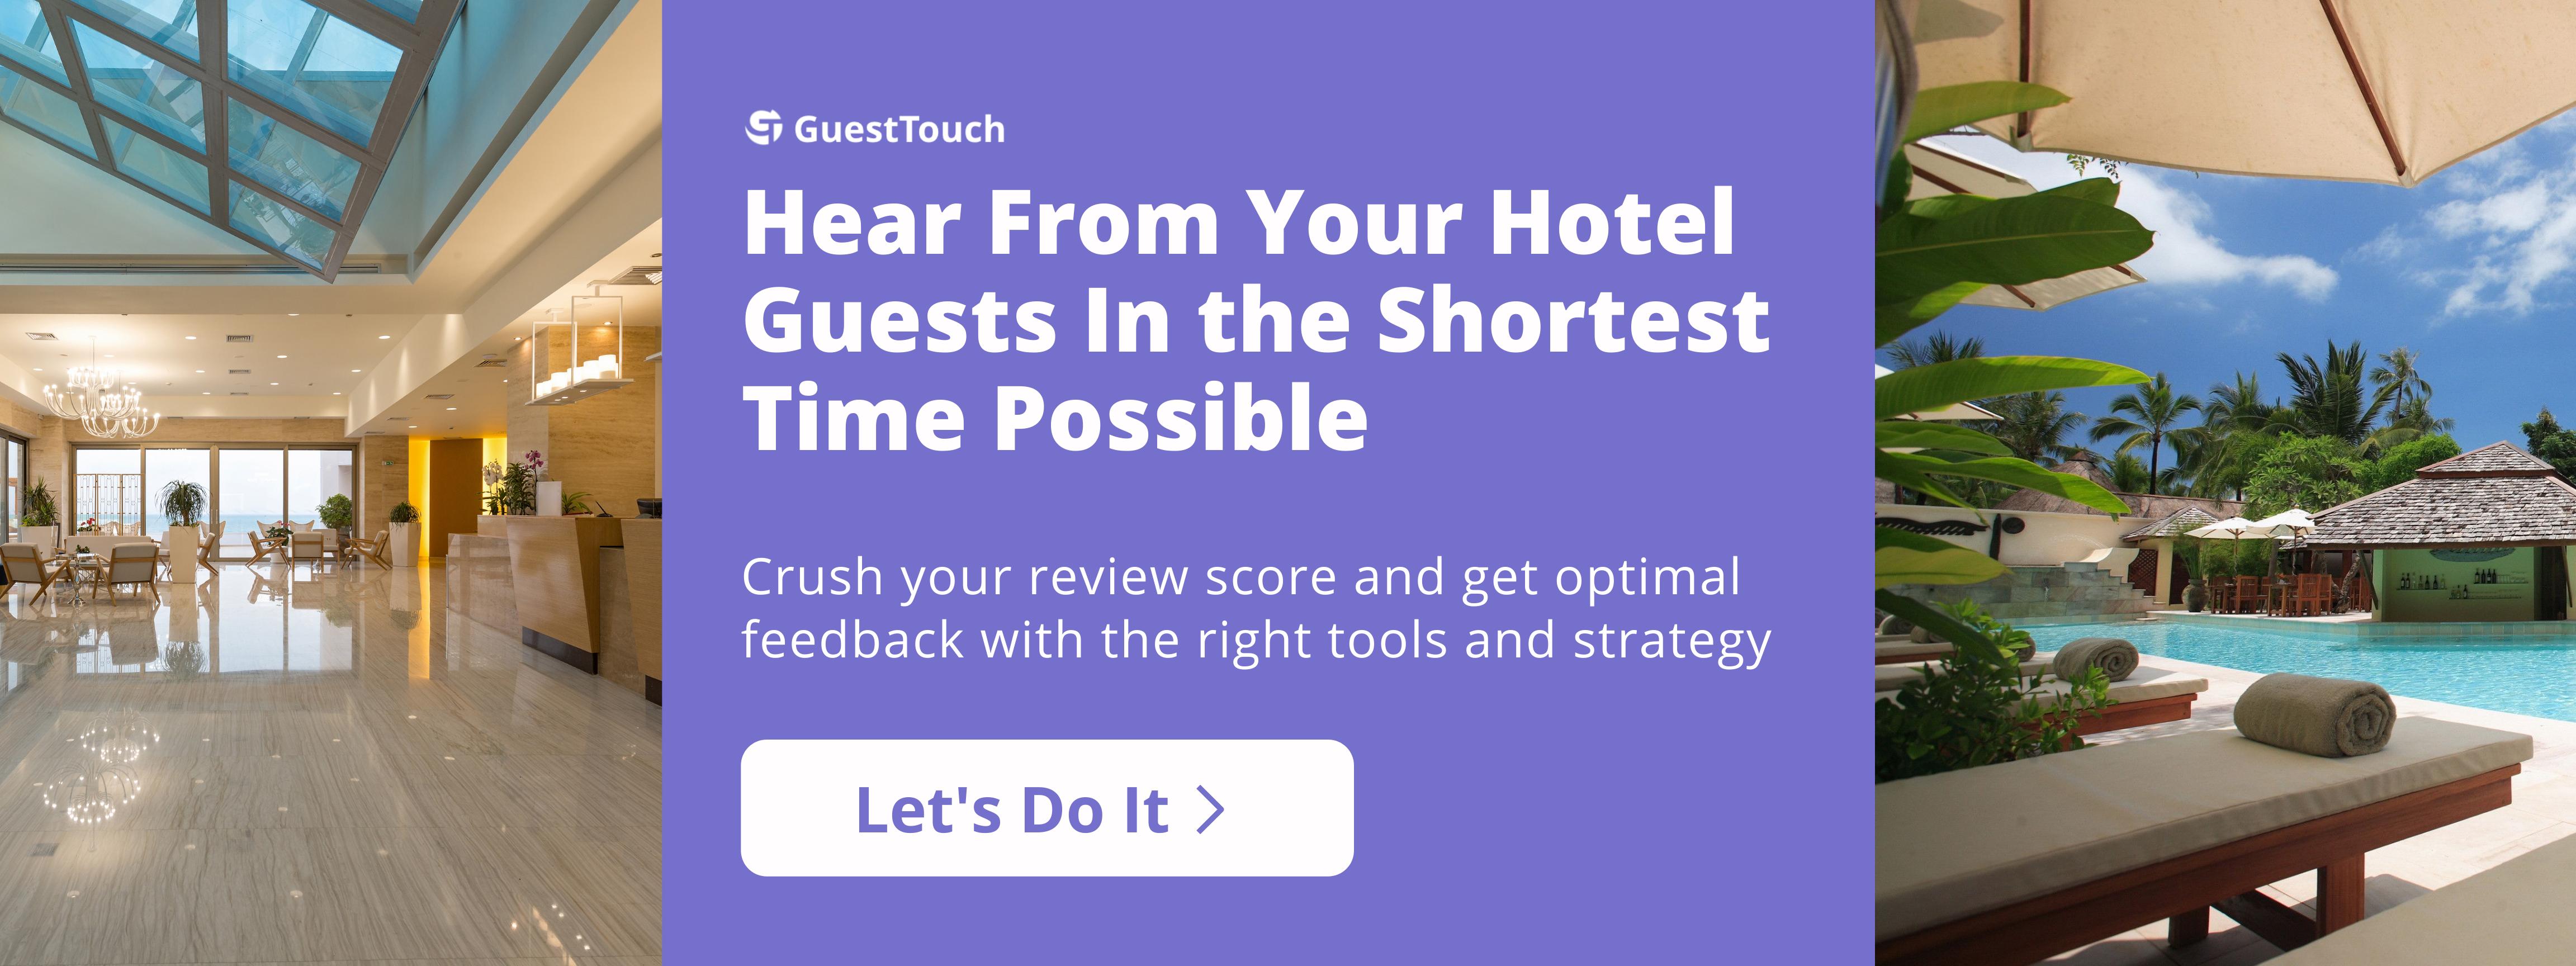 alternate guest feedback for hotels CTA